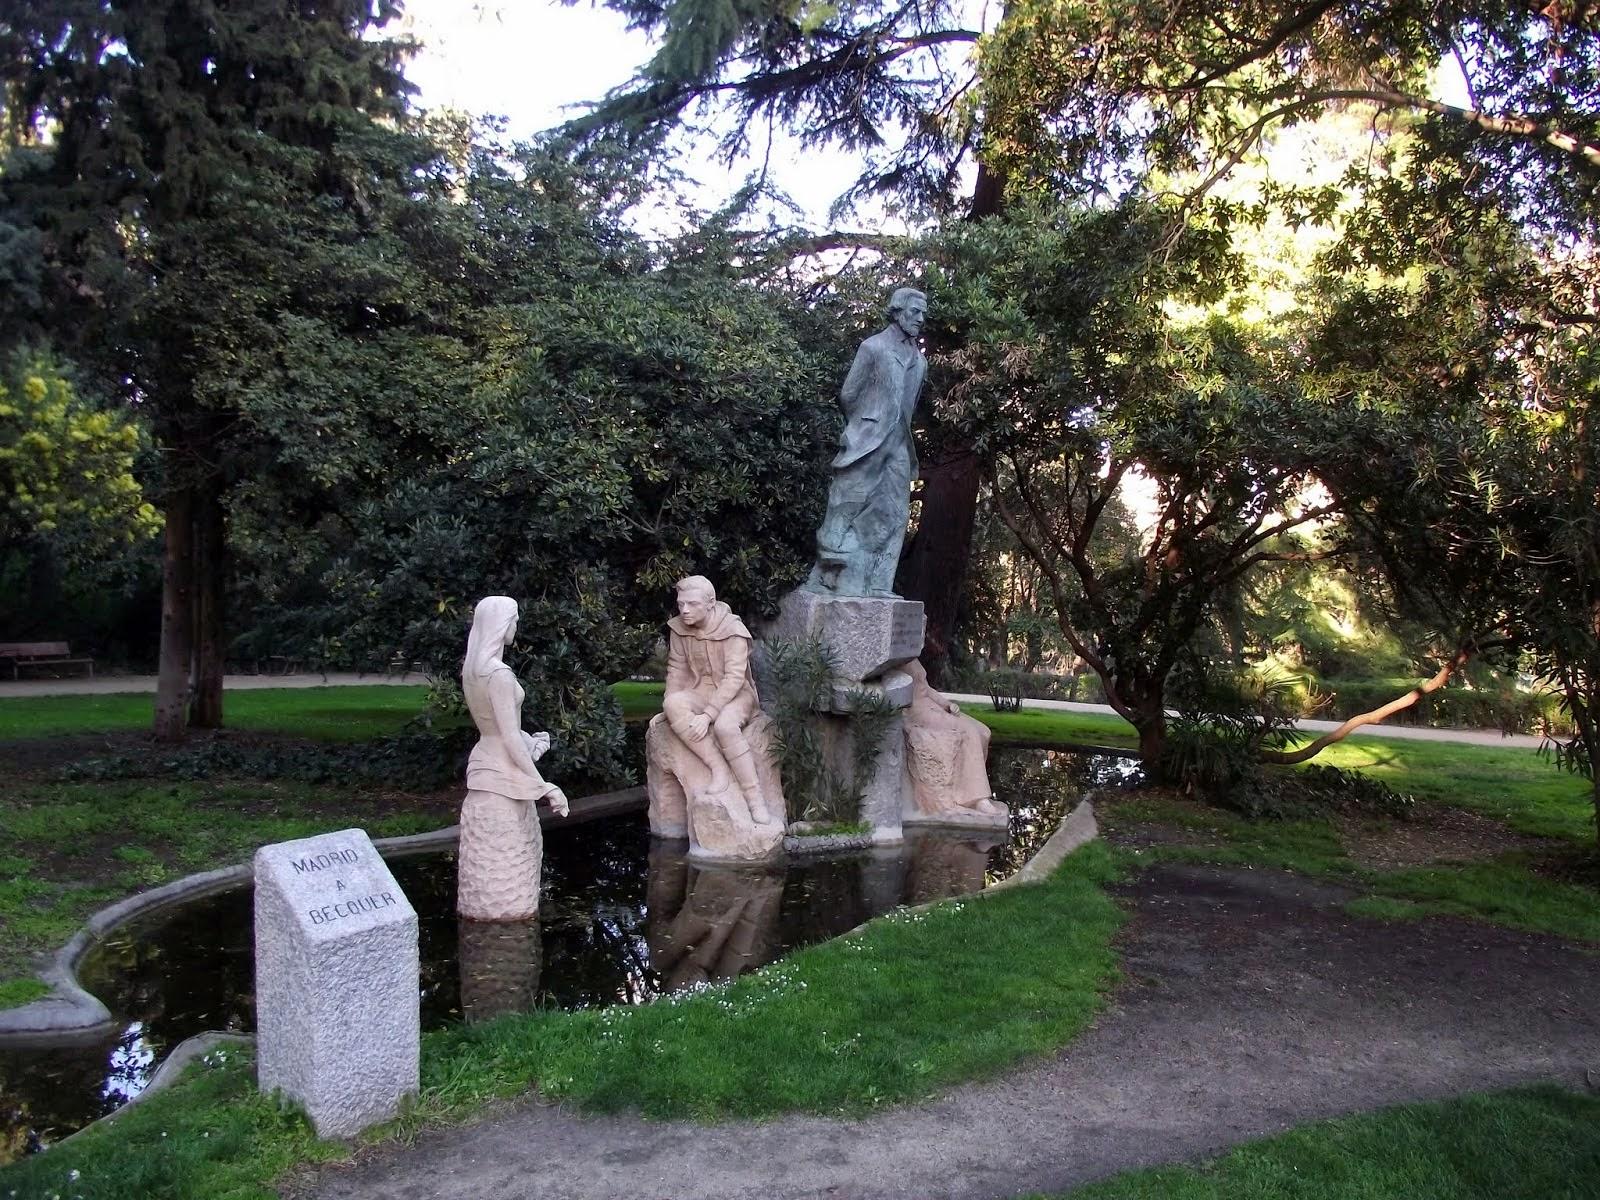 Ampa csb madrid parque quinta de la fuente del berro for Piscina fuente del berro